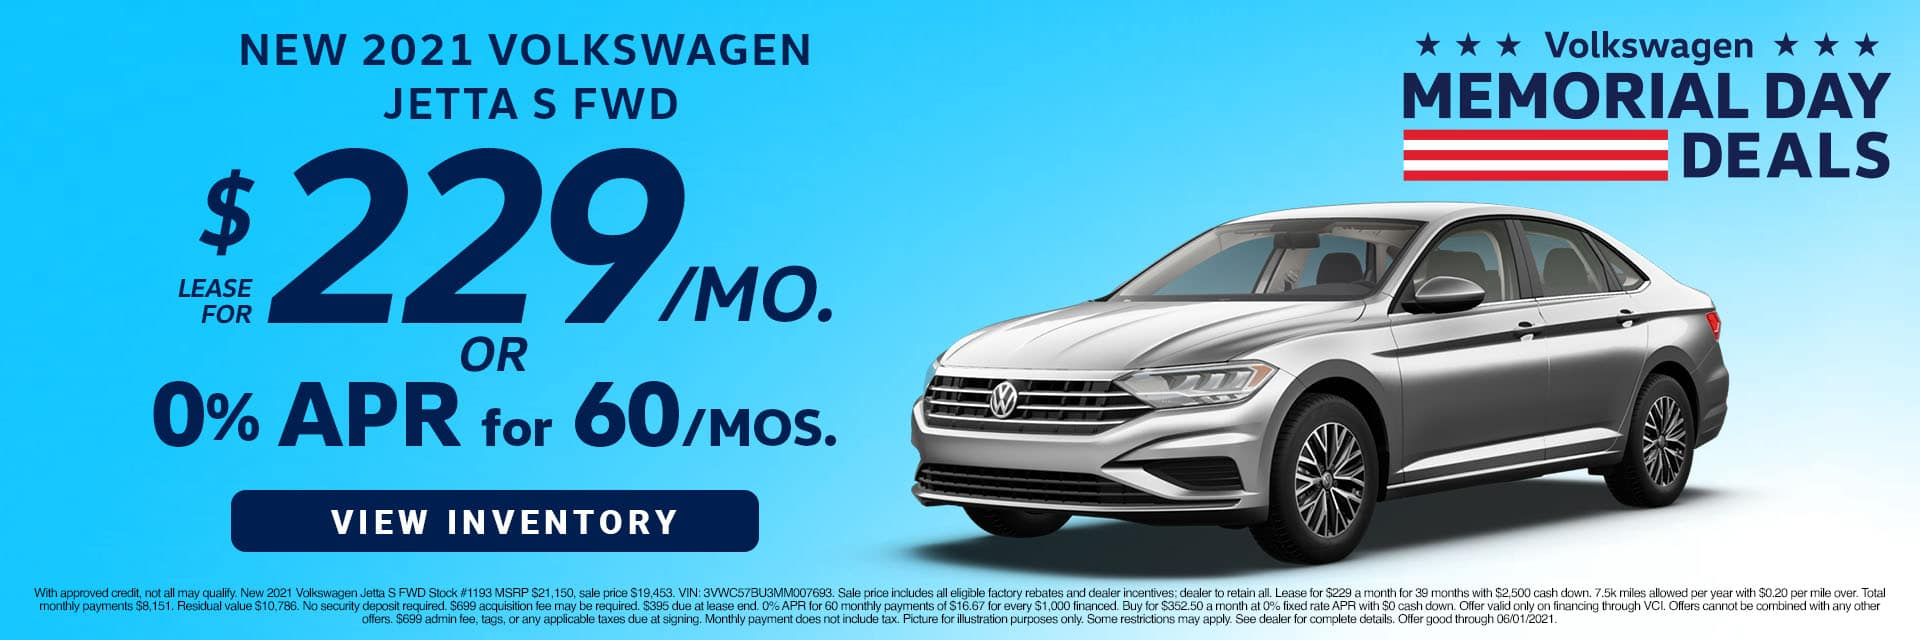 CVWG-May 20212021 Volkswagen Jetta